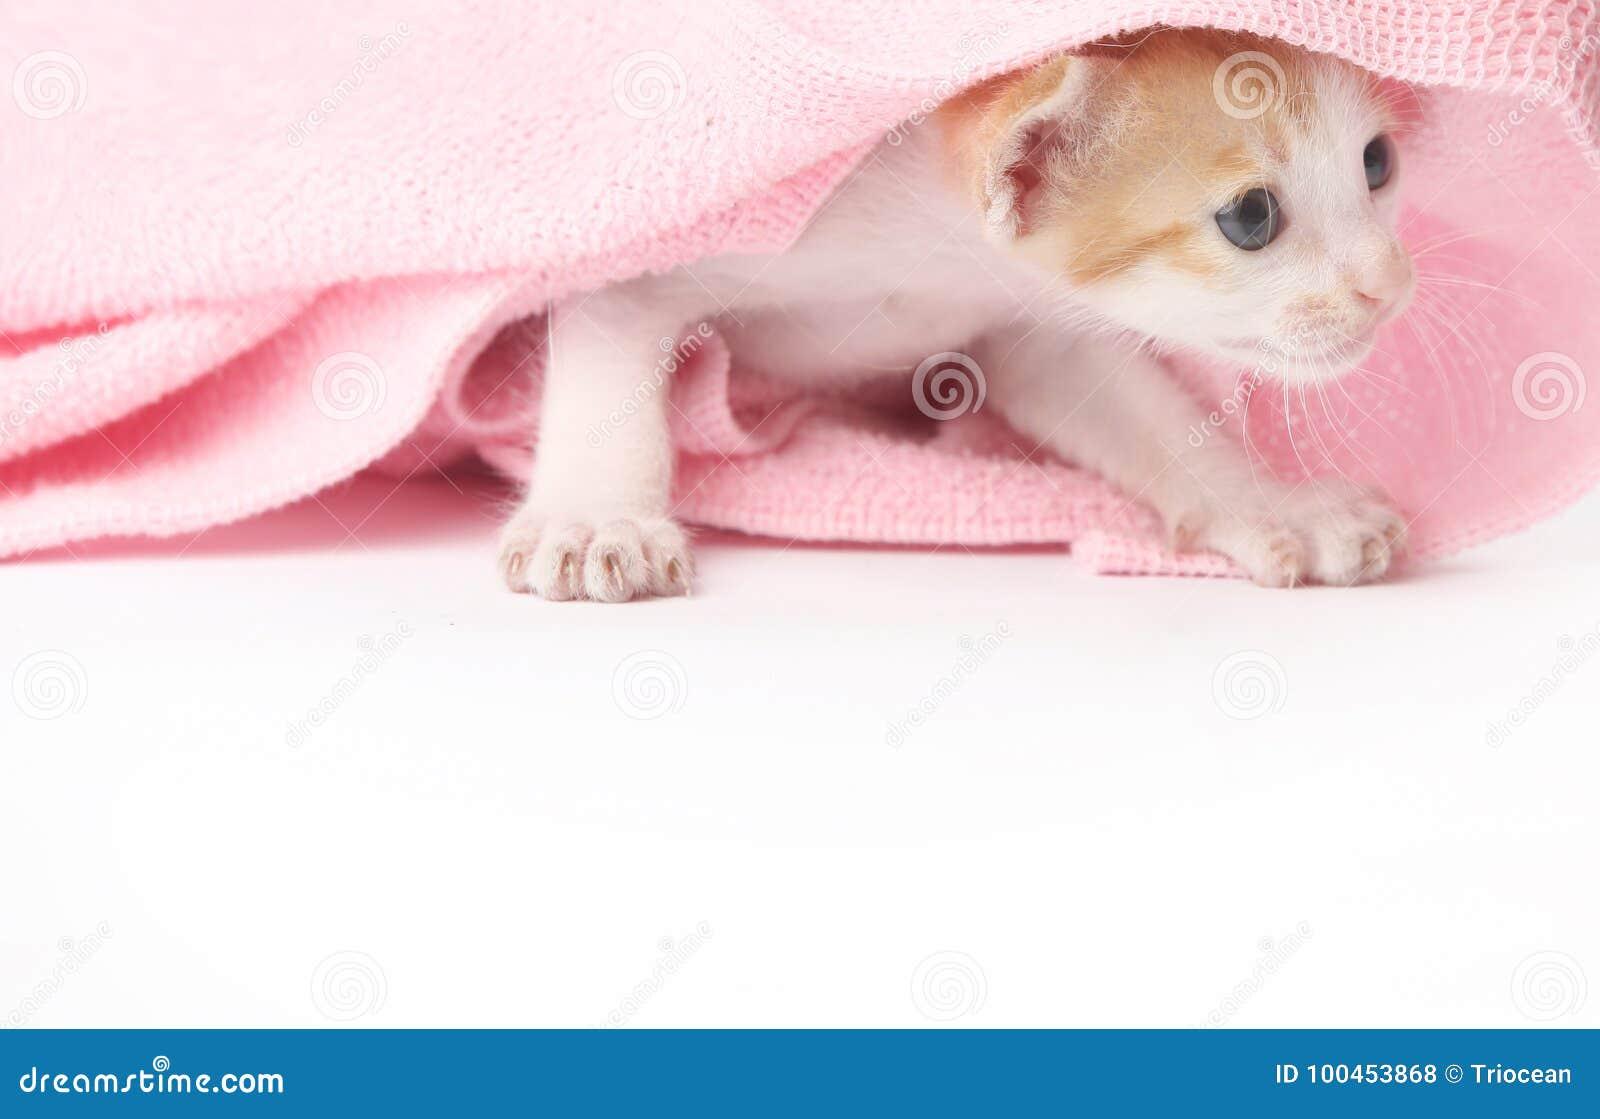 Cute Baby Kitten Stock Photo Image Of Beautiful Fluffy 100453868